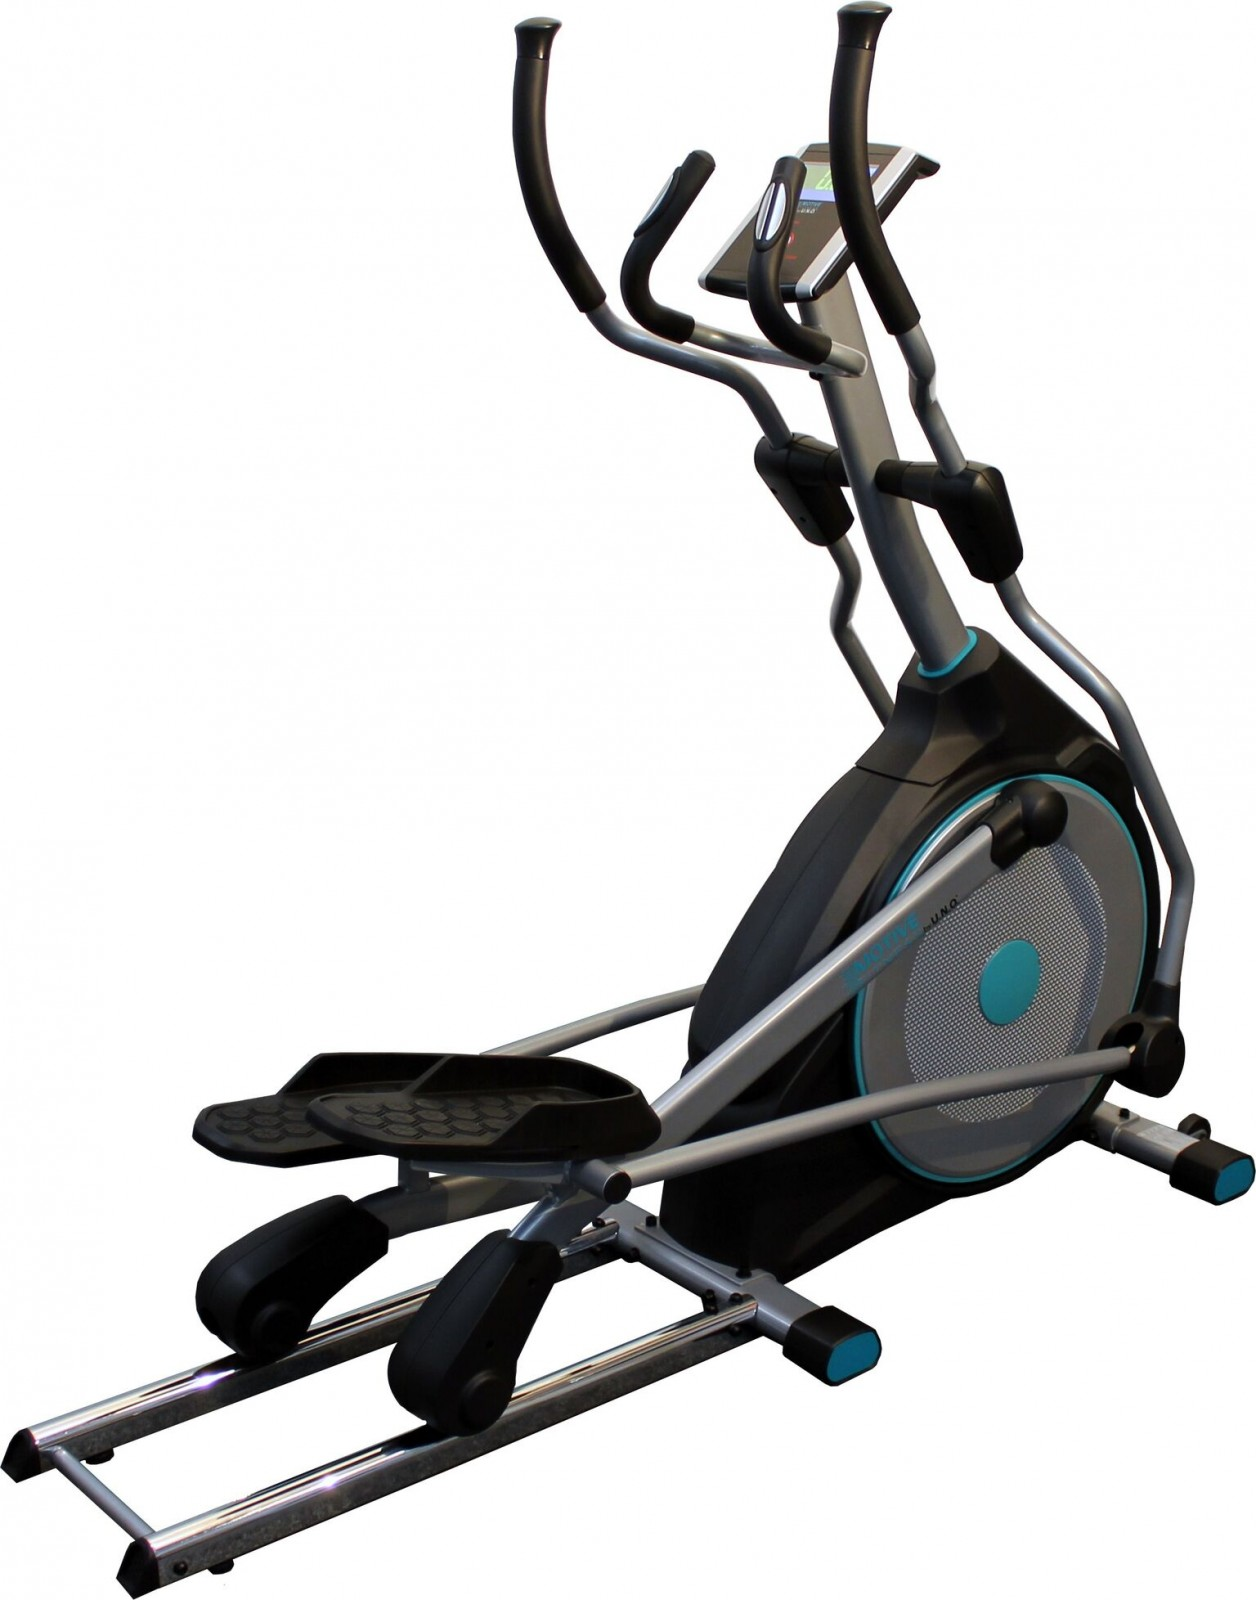 u n o fitness crosstrainer xe 300 g nstig kaufen sport tiedje. Black Bedroom Furniture Sets. Home Design Ideas